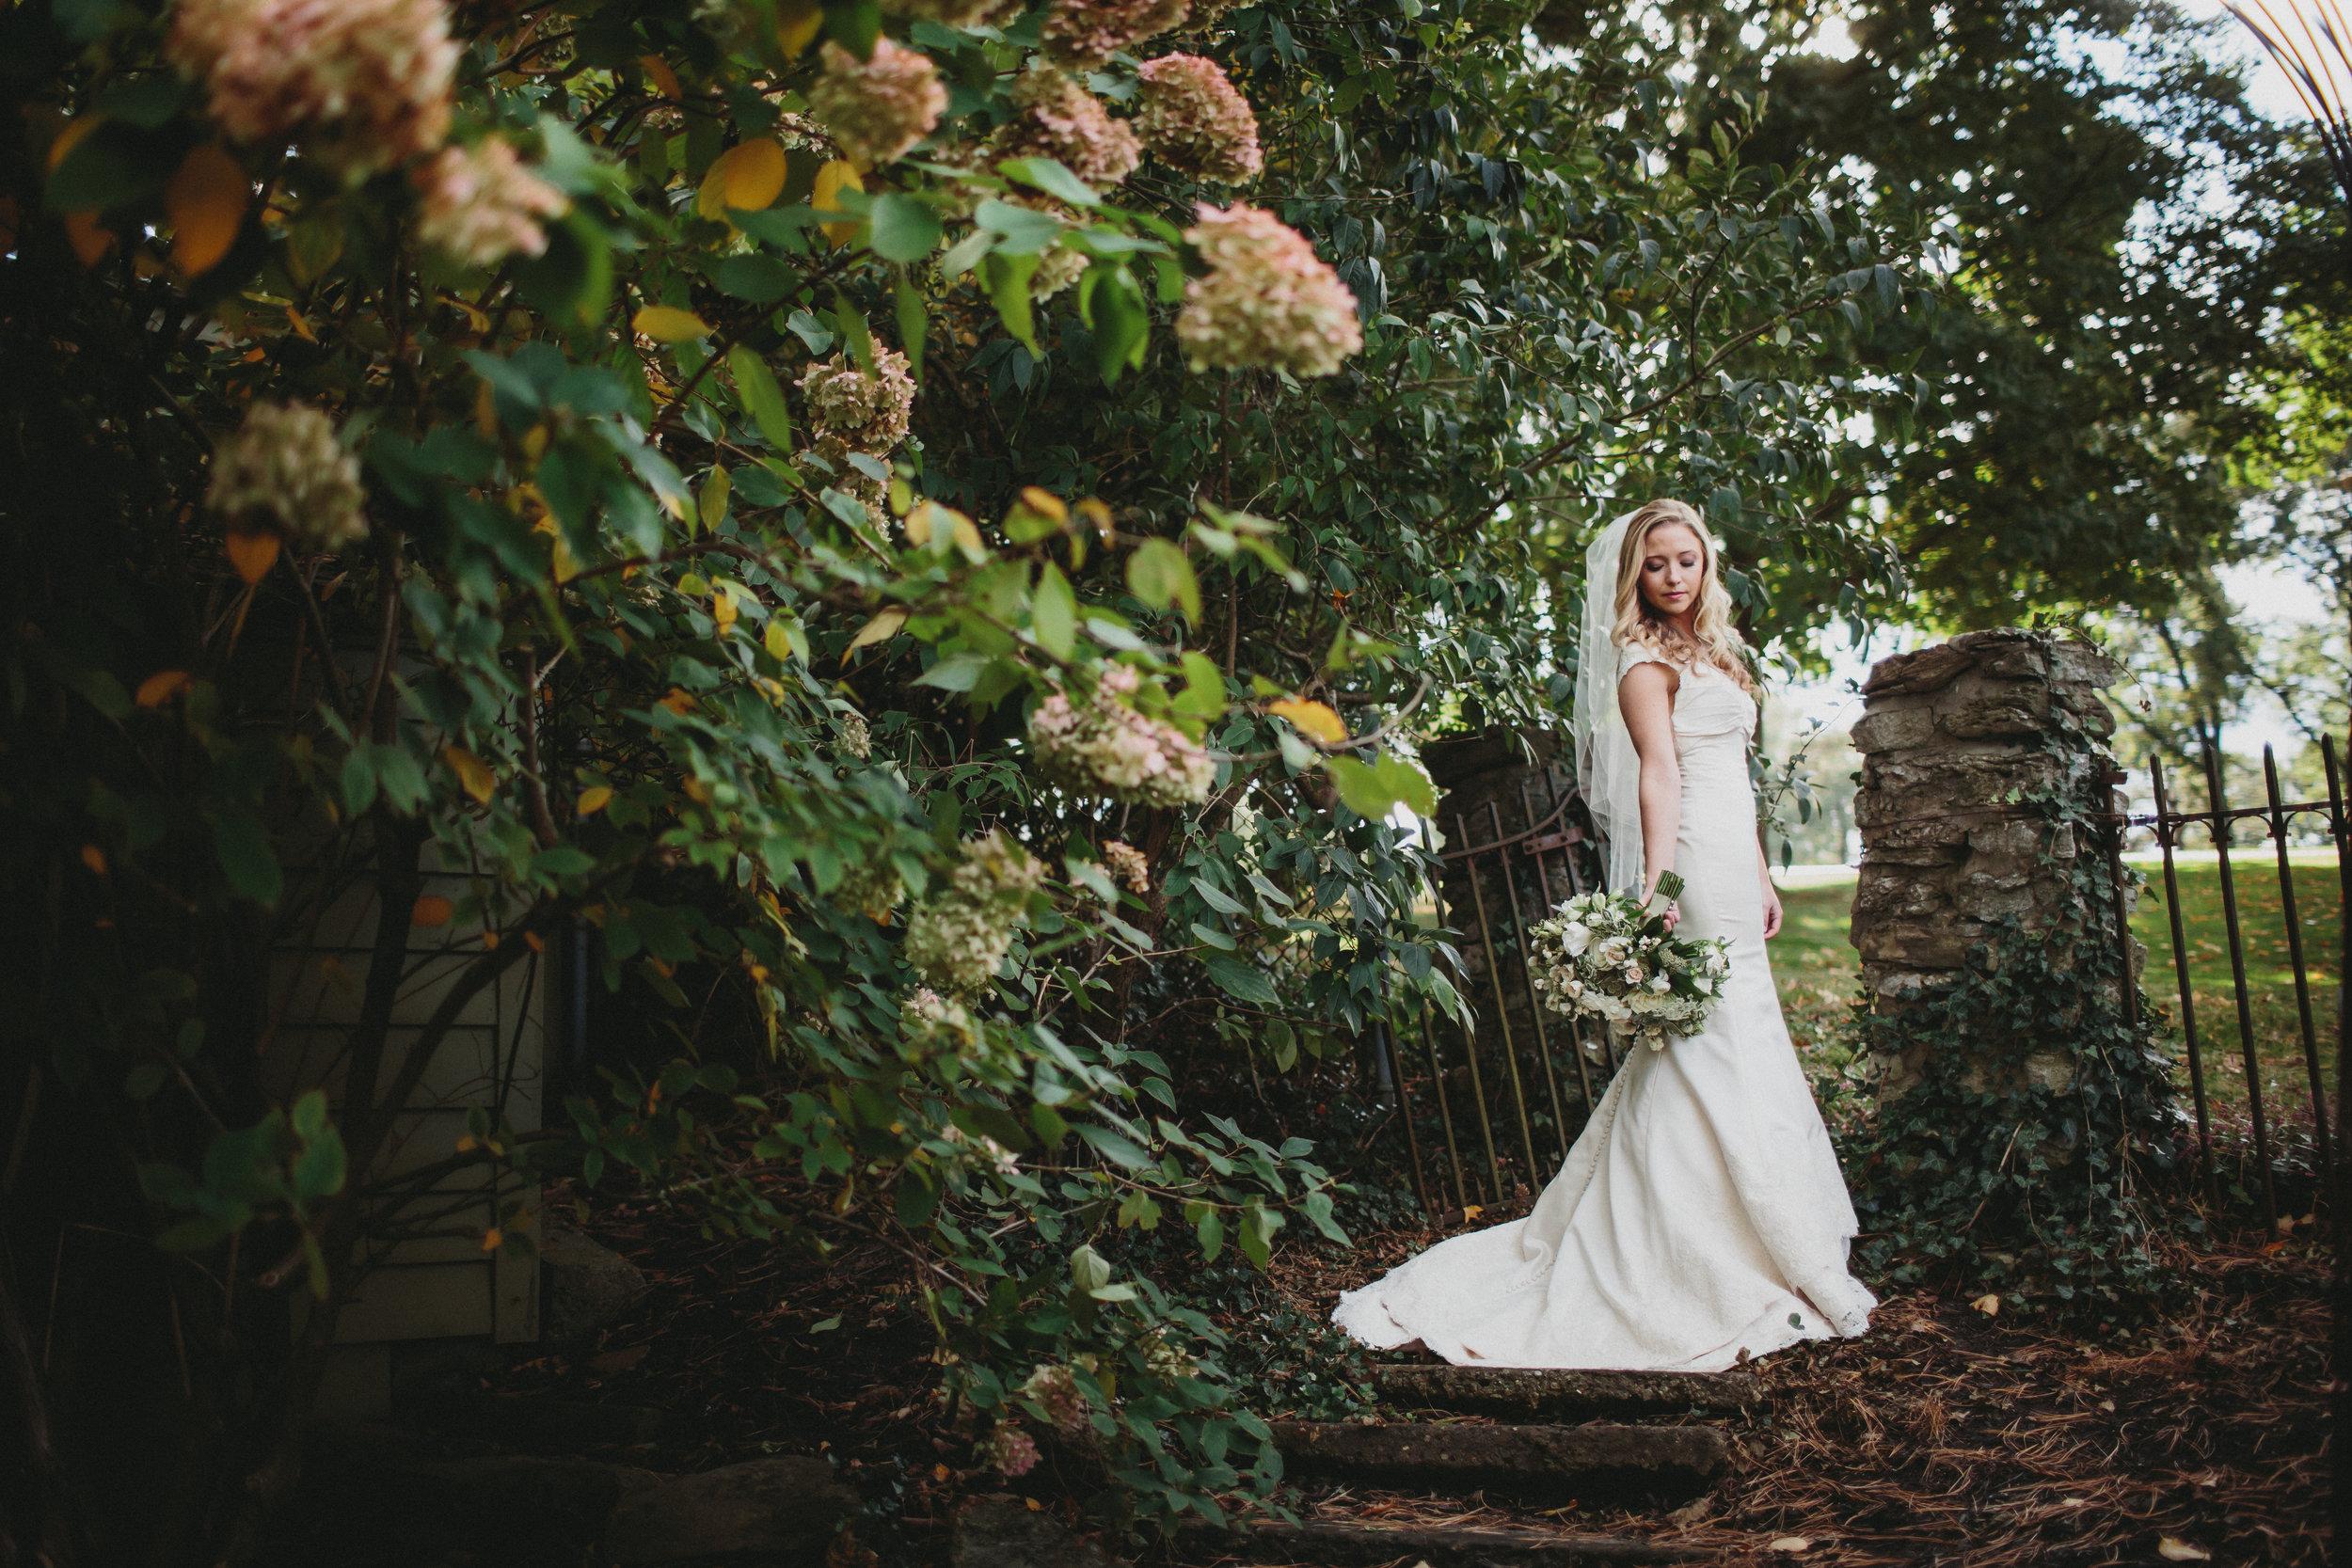 Green and White Wedding photos